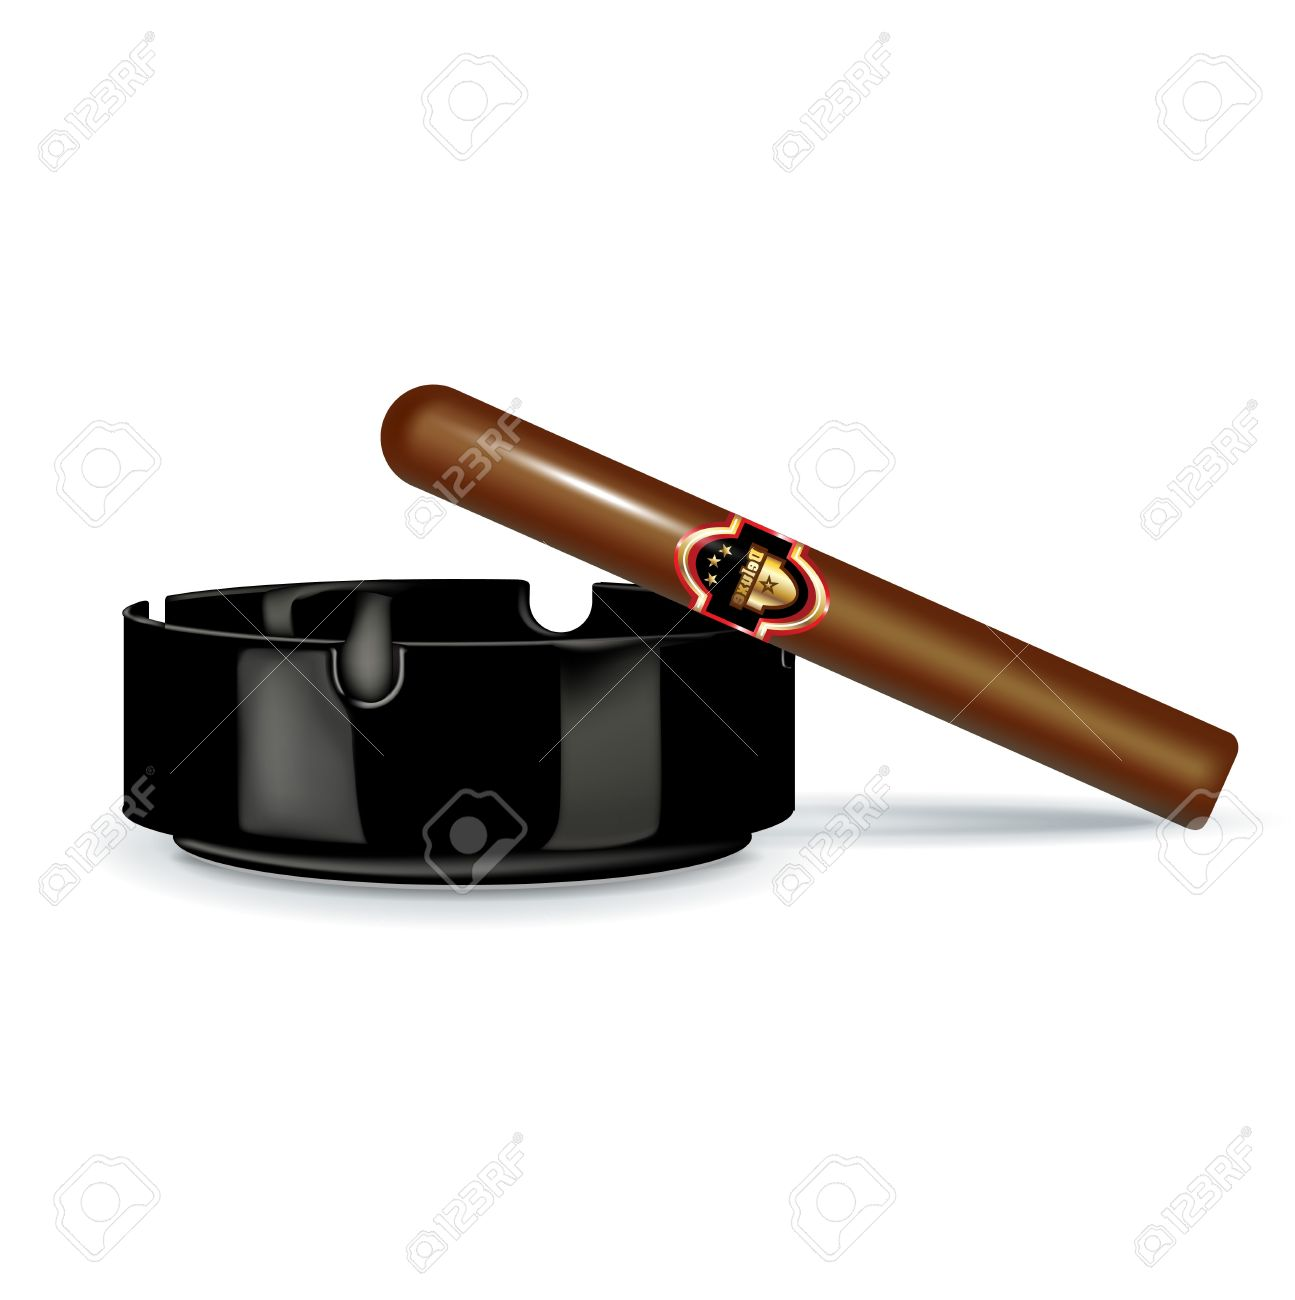 Cigar clipart blunt Clipart Havana Cigar white collection